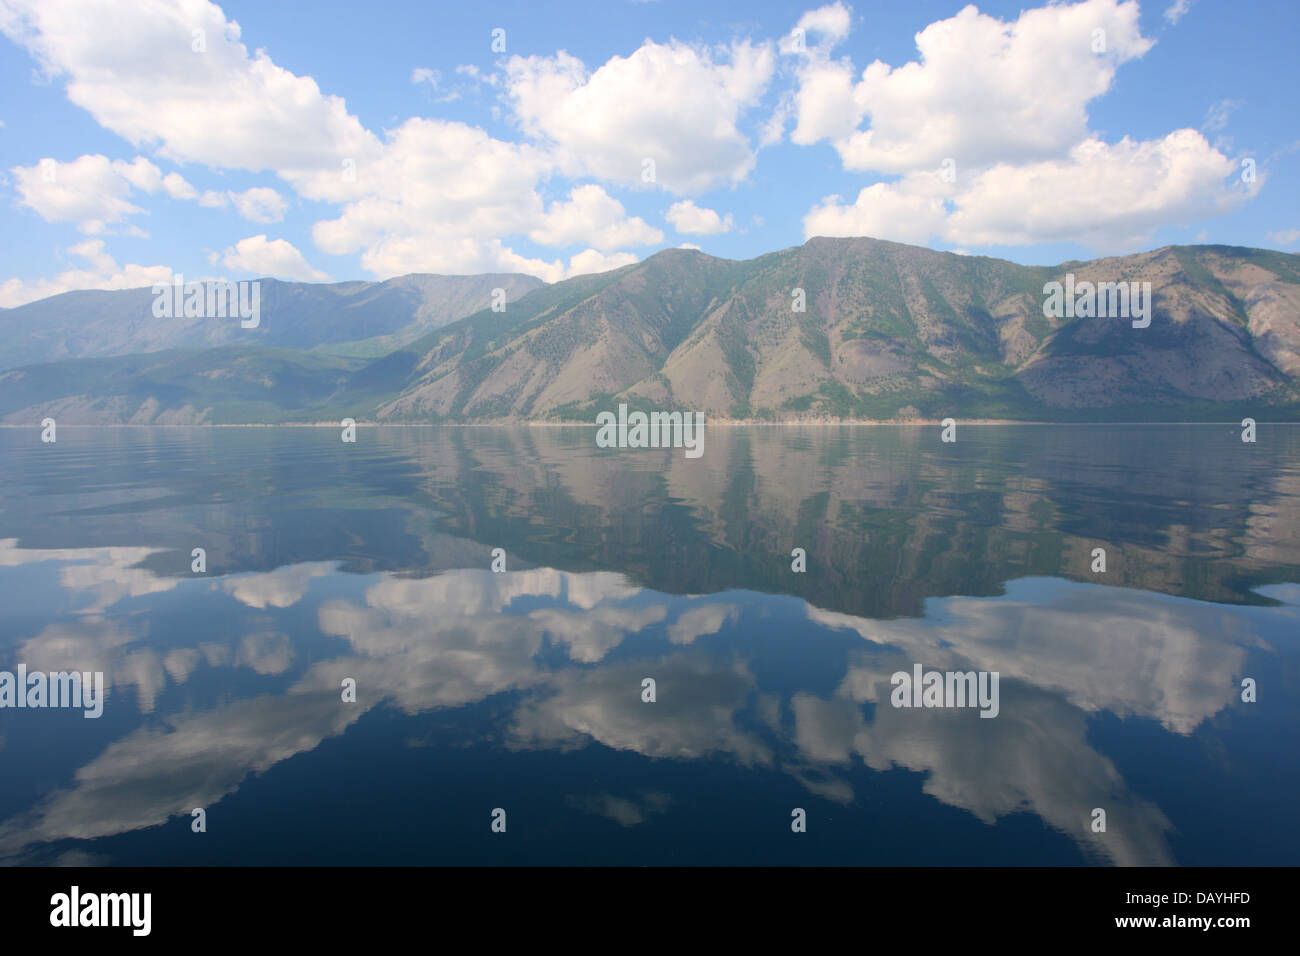 Lake Baikal, Siberia, Russia - Stock Image